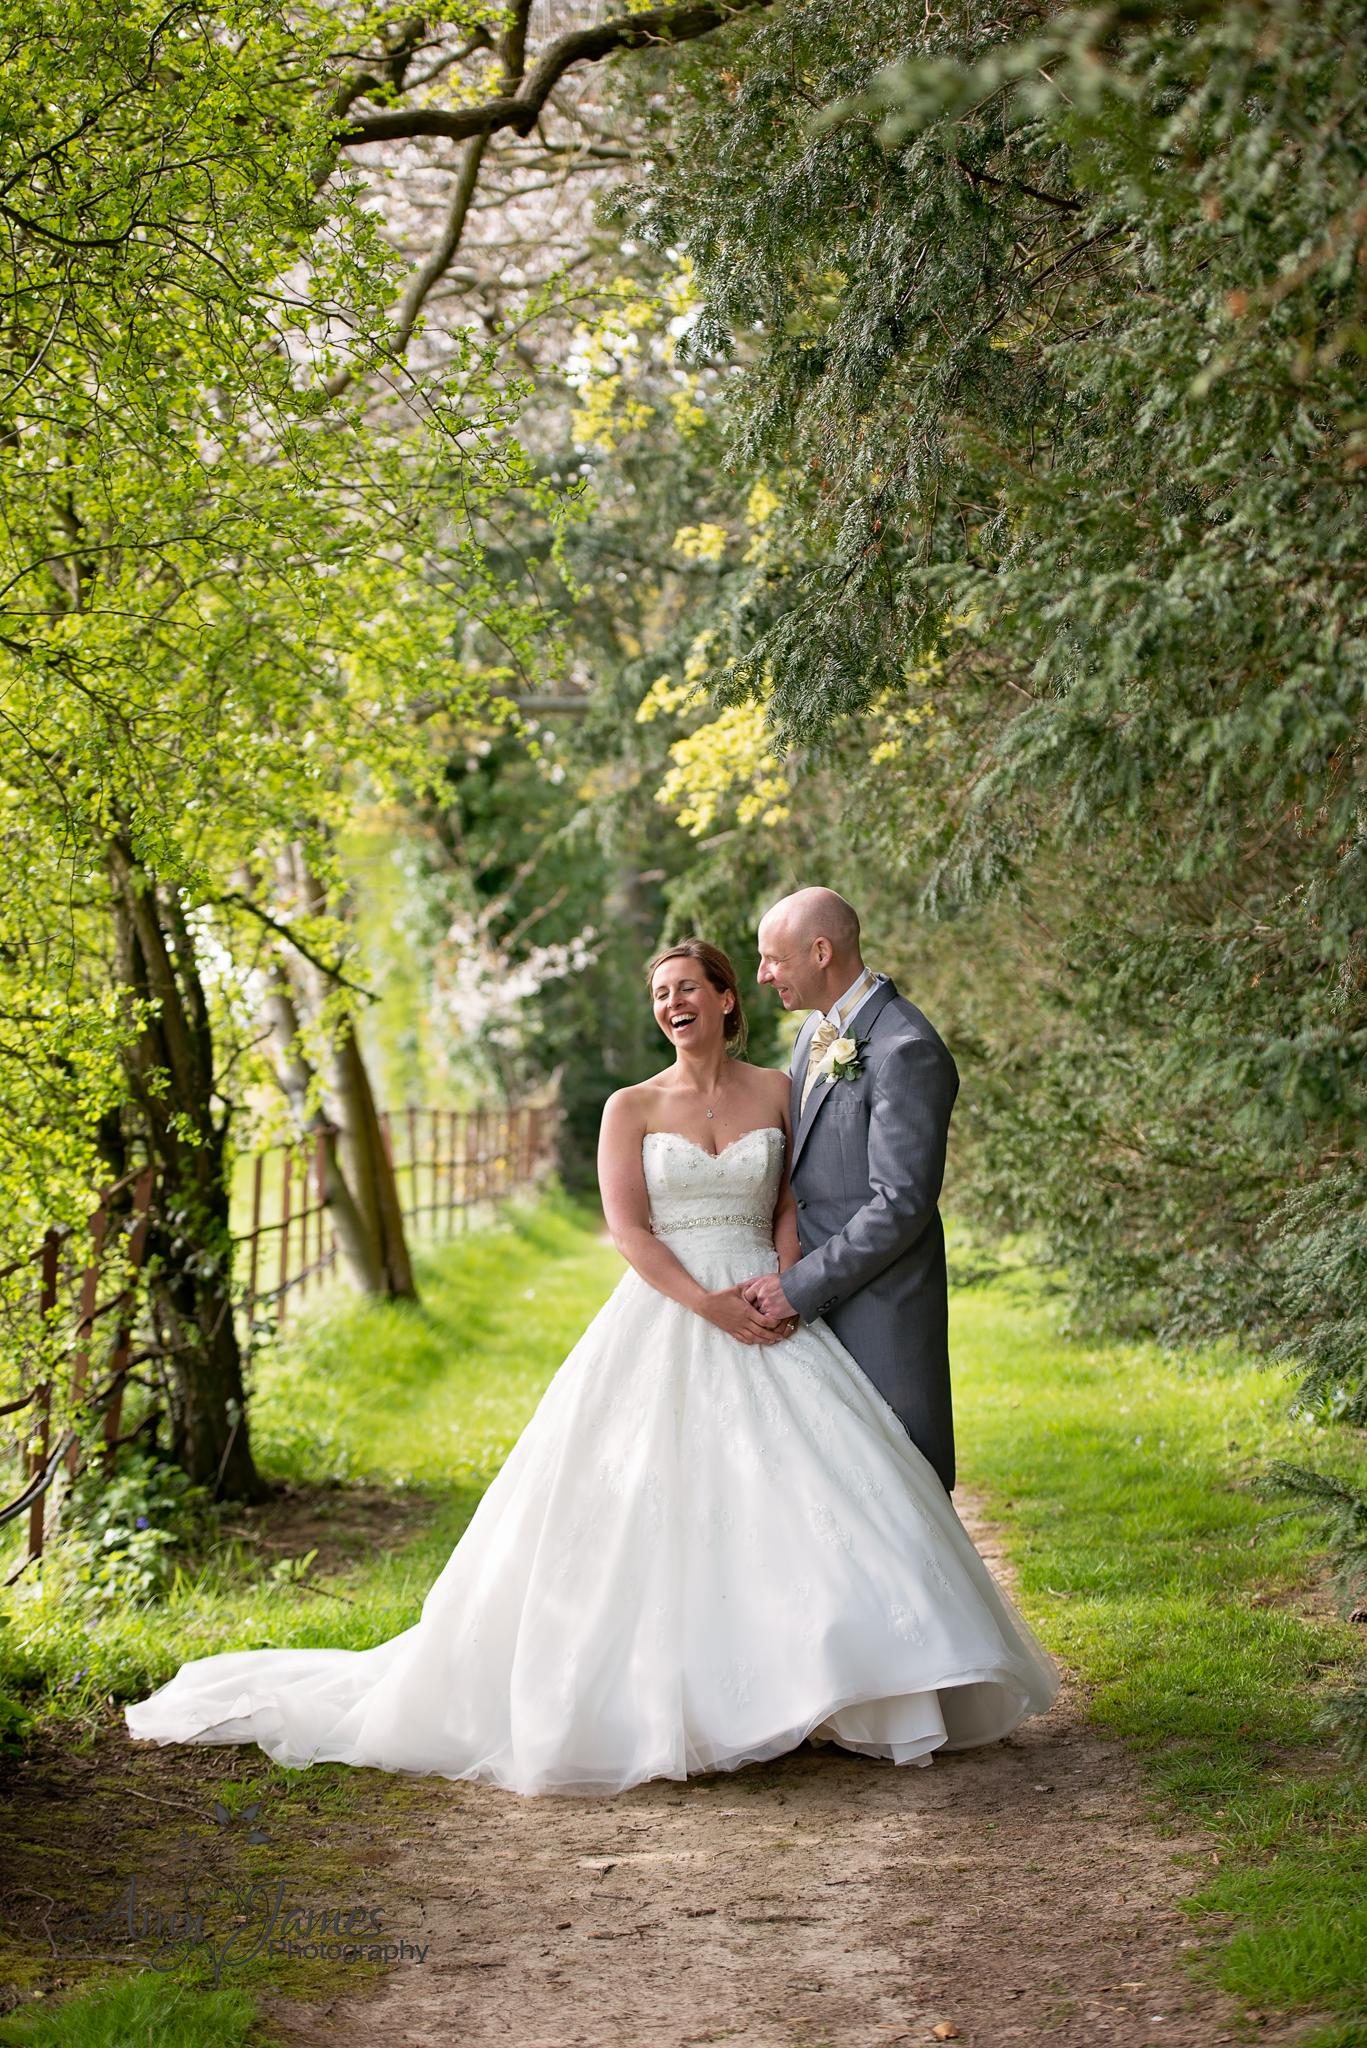 Amy James Photography / Hampshire Wedding Photographer / Basingstoke Wedding // Hampshire wedding venues // Audleys Wood Hotel Wedding